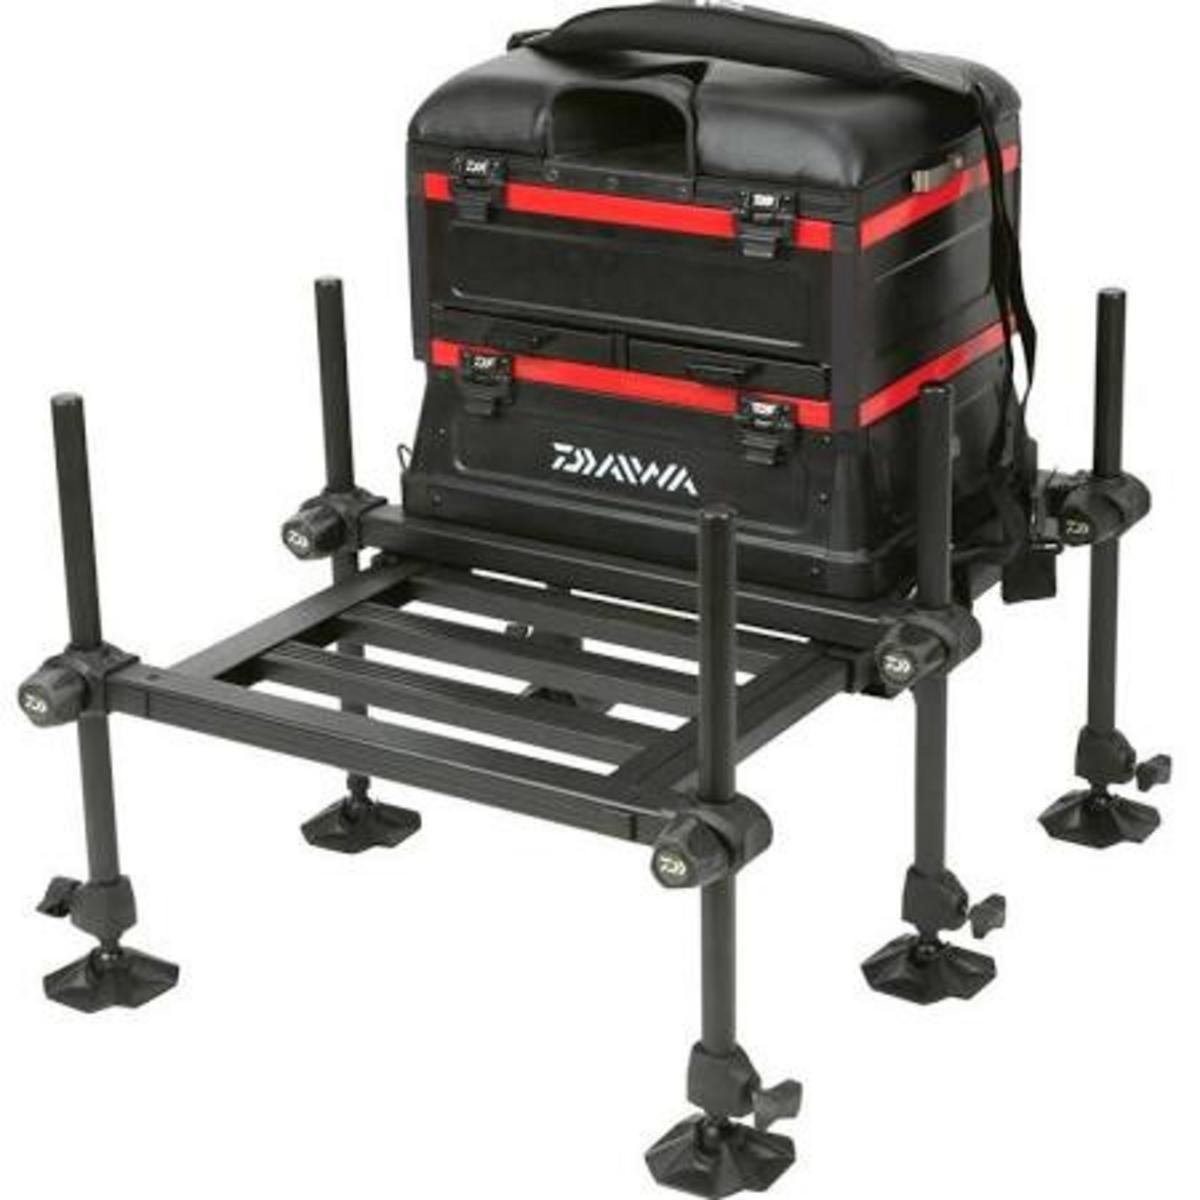 DAIWA 160  SEAT BOX Model No D160SB-R SEATBOX RRP £375